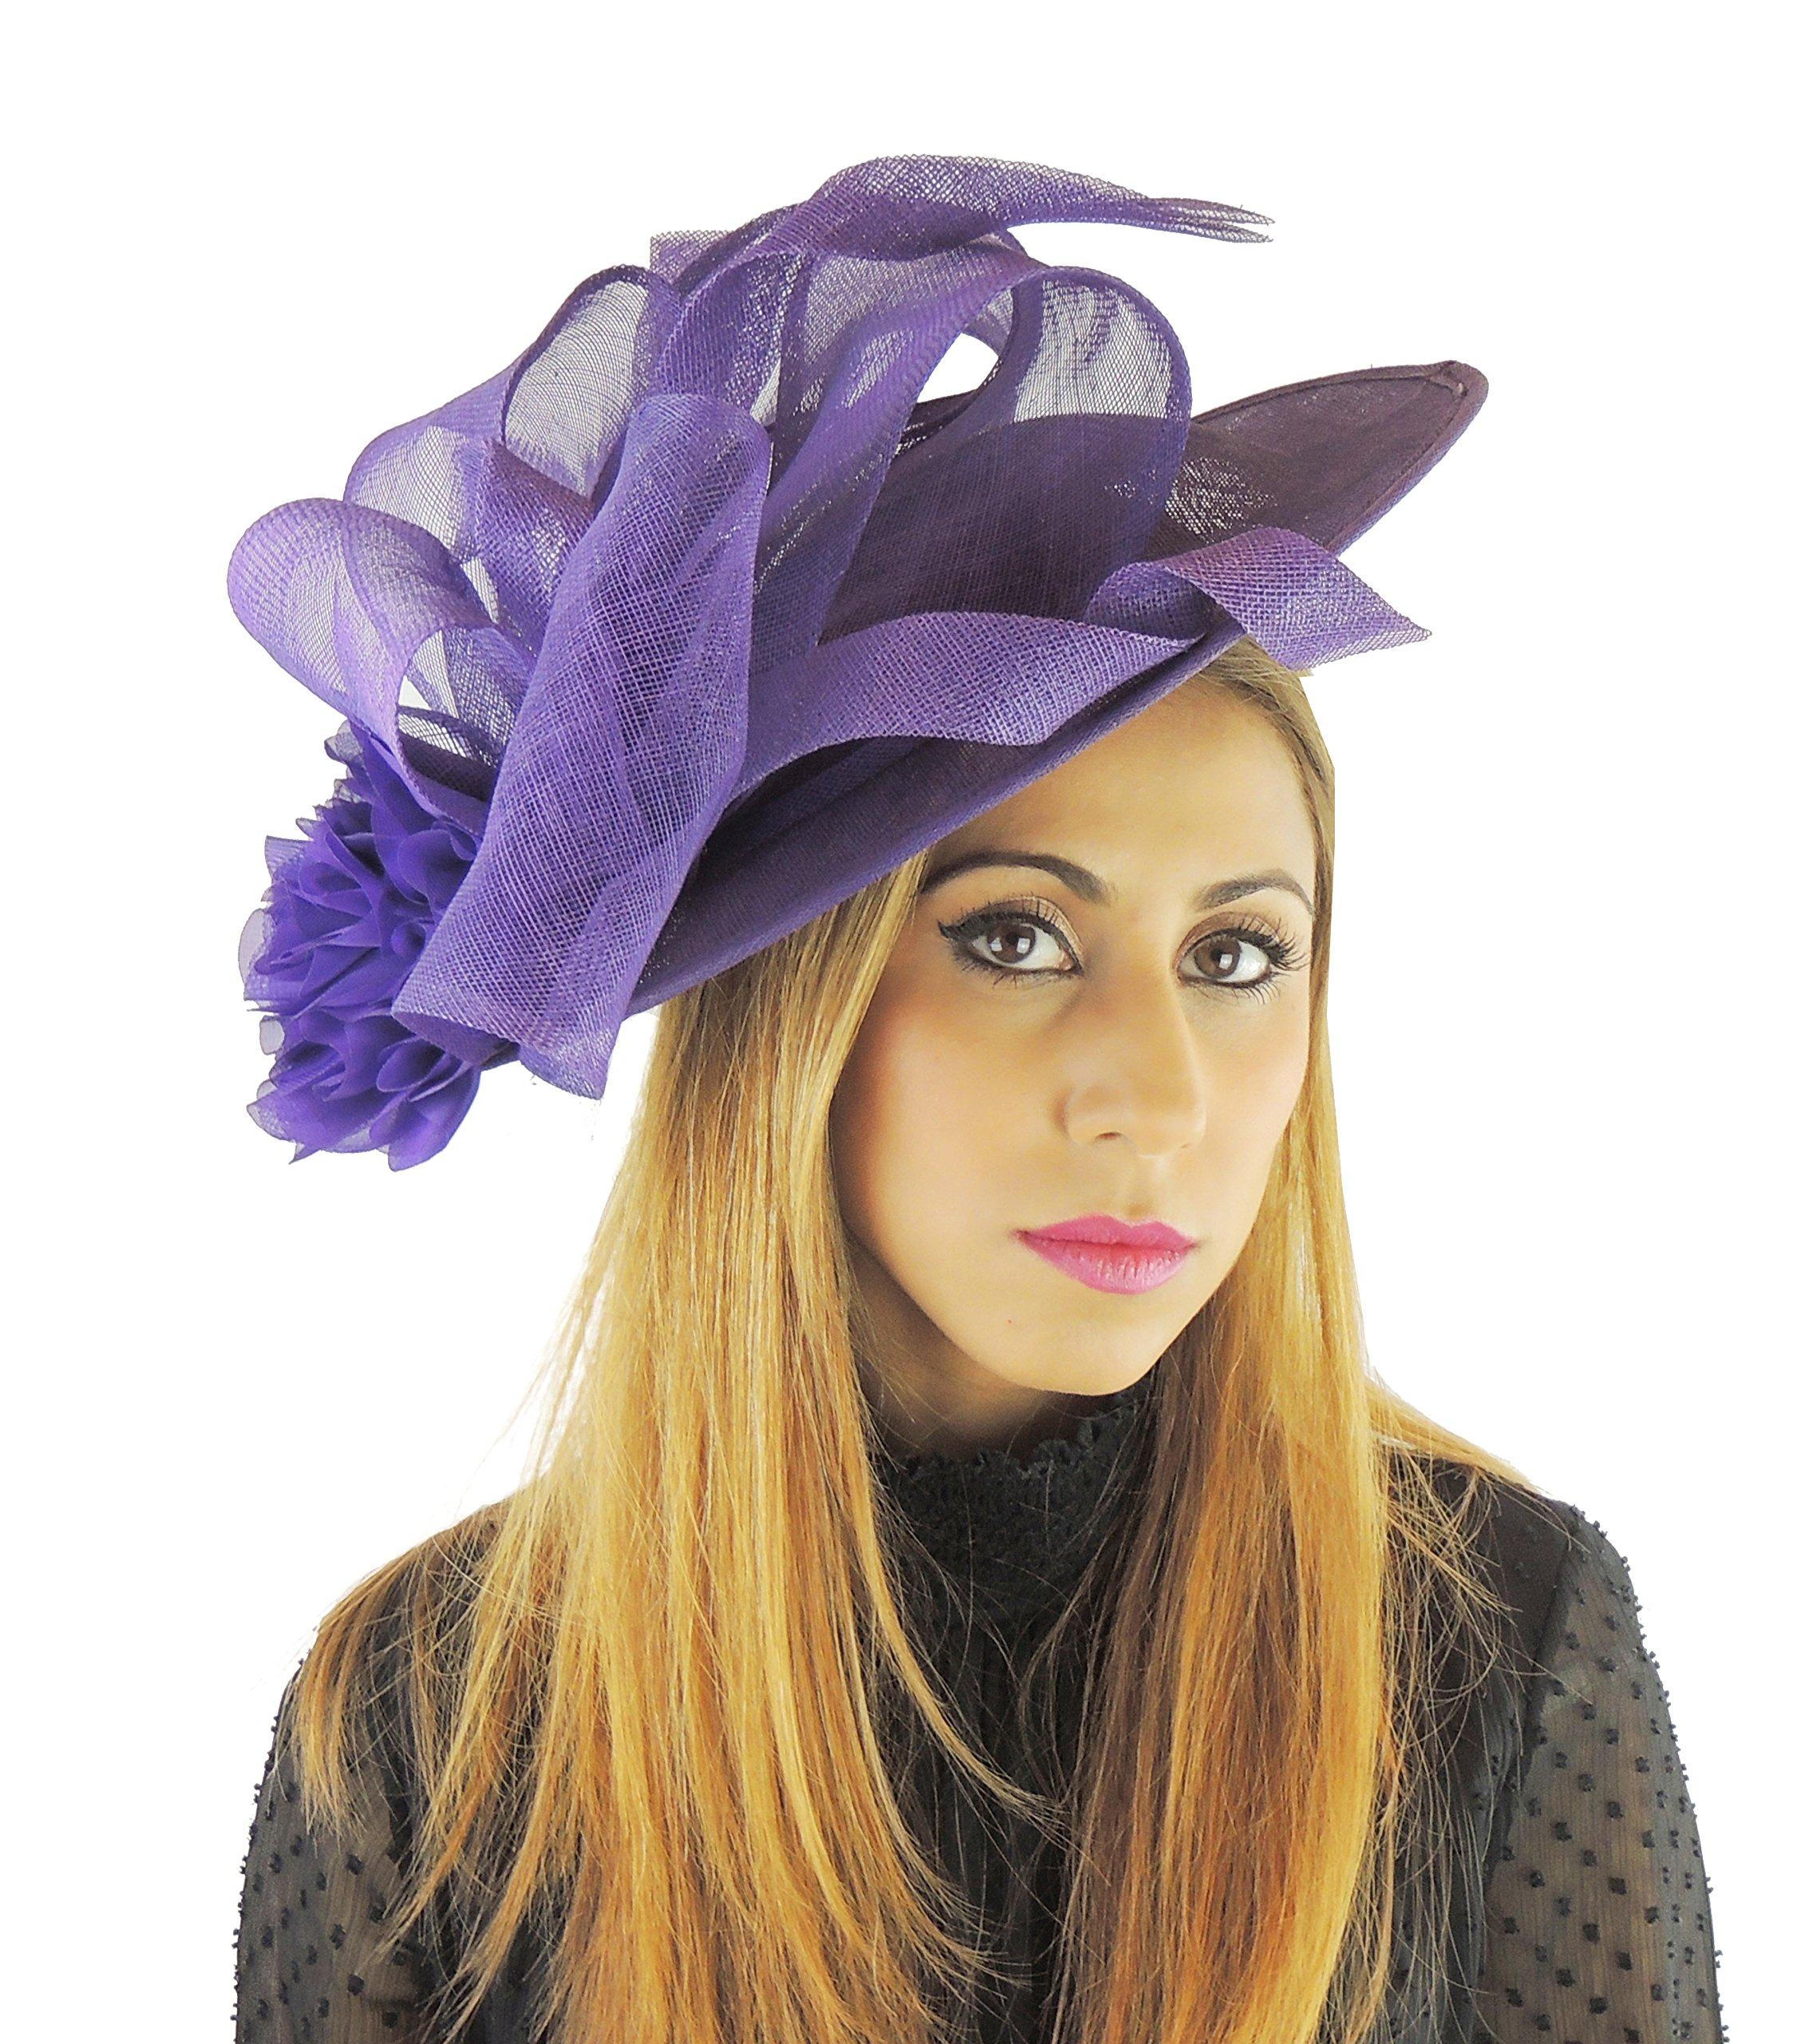 Hats By Cressida Ladies Wedding Races Ascot Derby Fascinator Headband Purple by Hats By Cressida